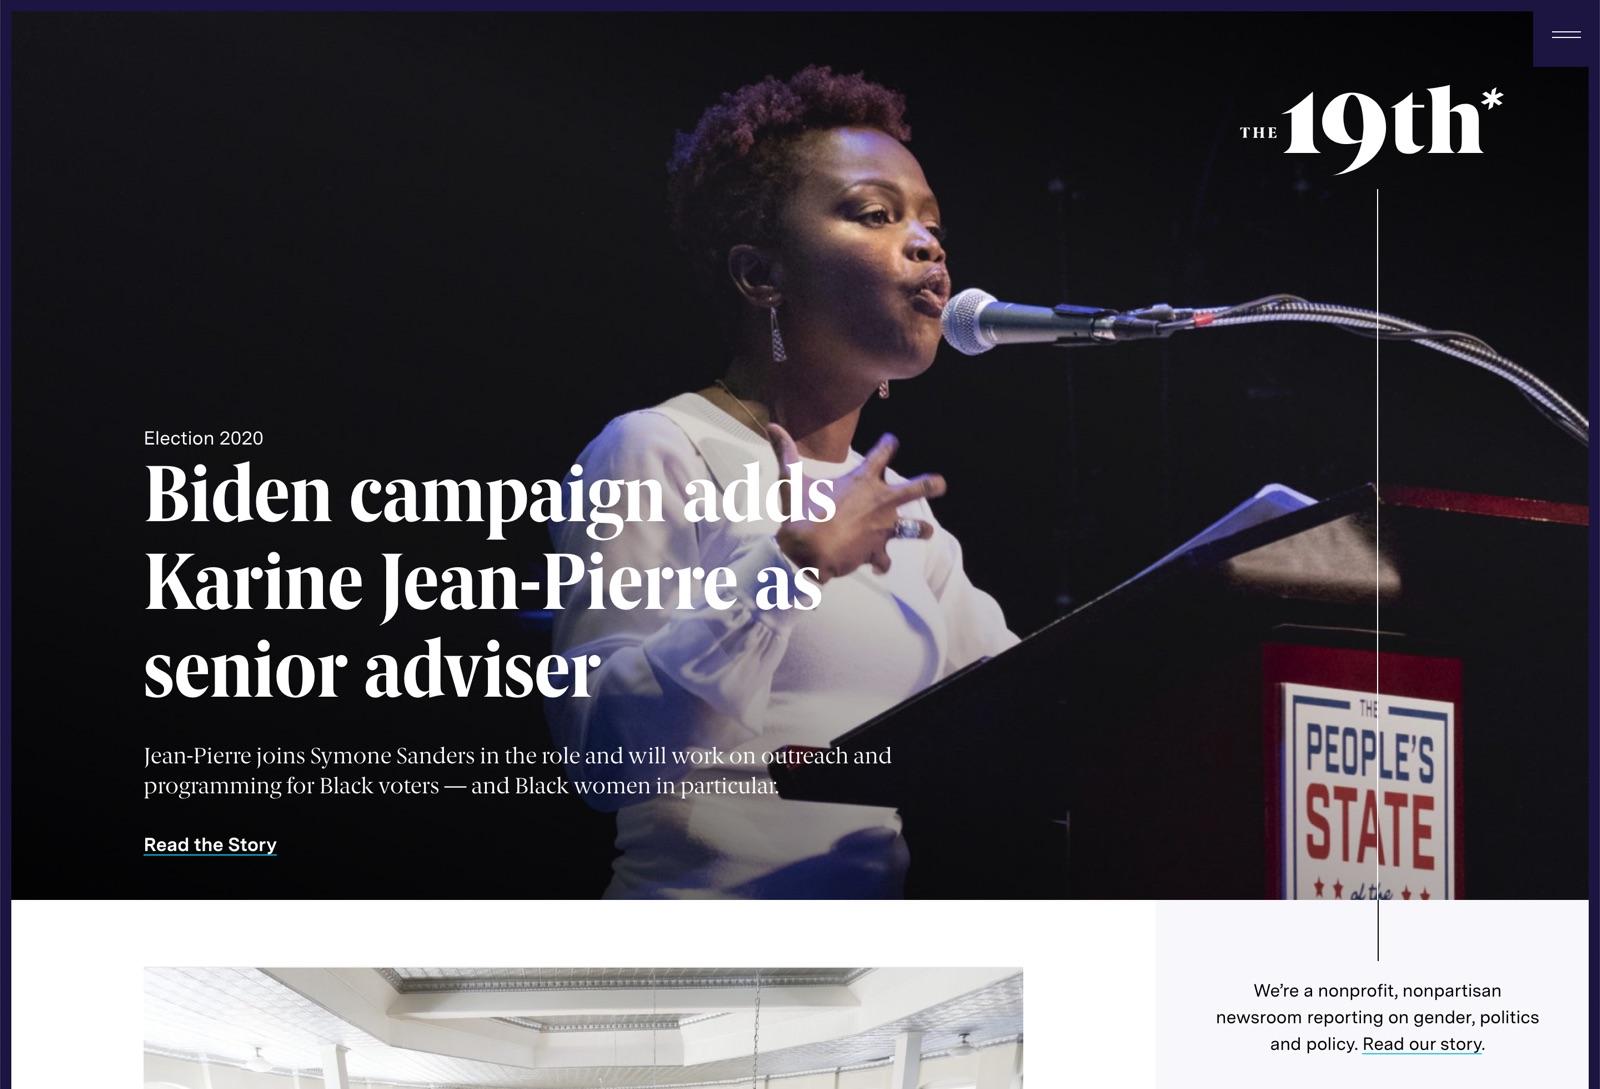 Article: Biden campaign adds Karine Jean-Pierre as senior adviser